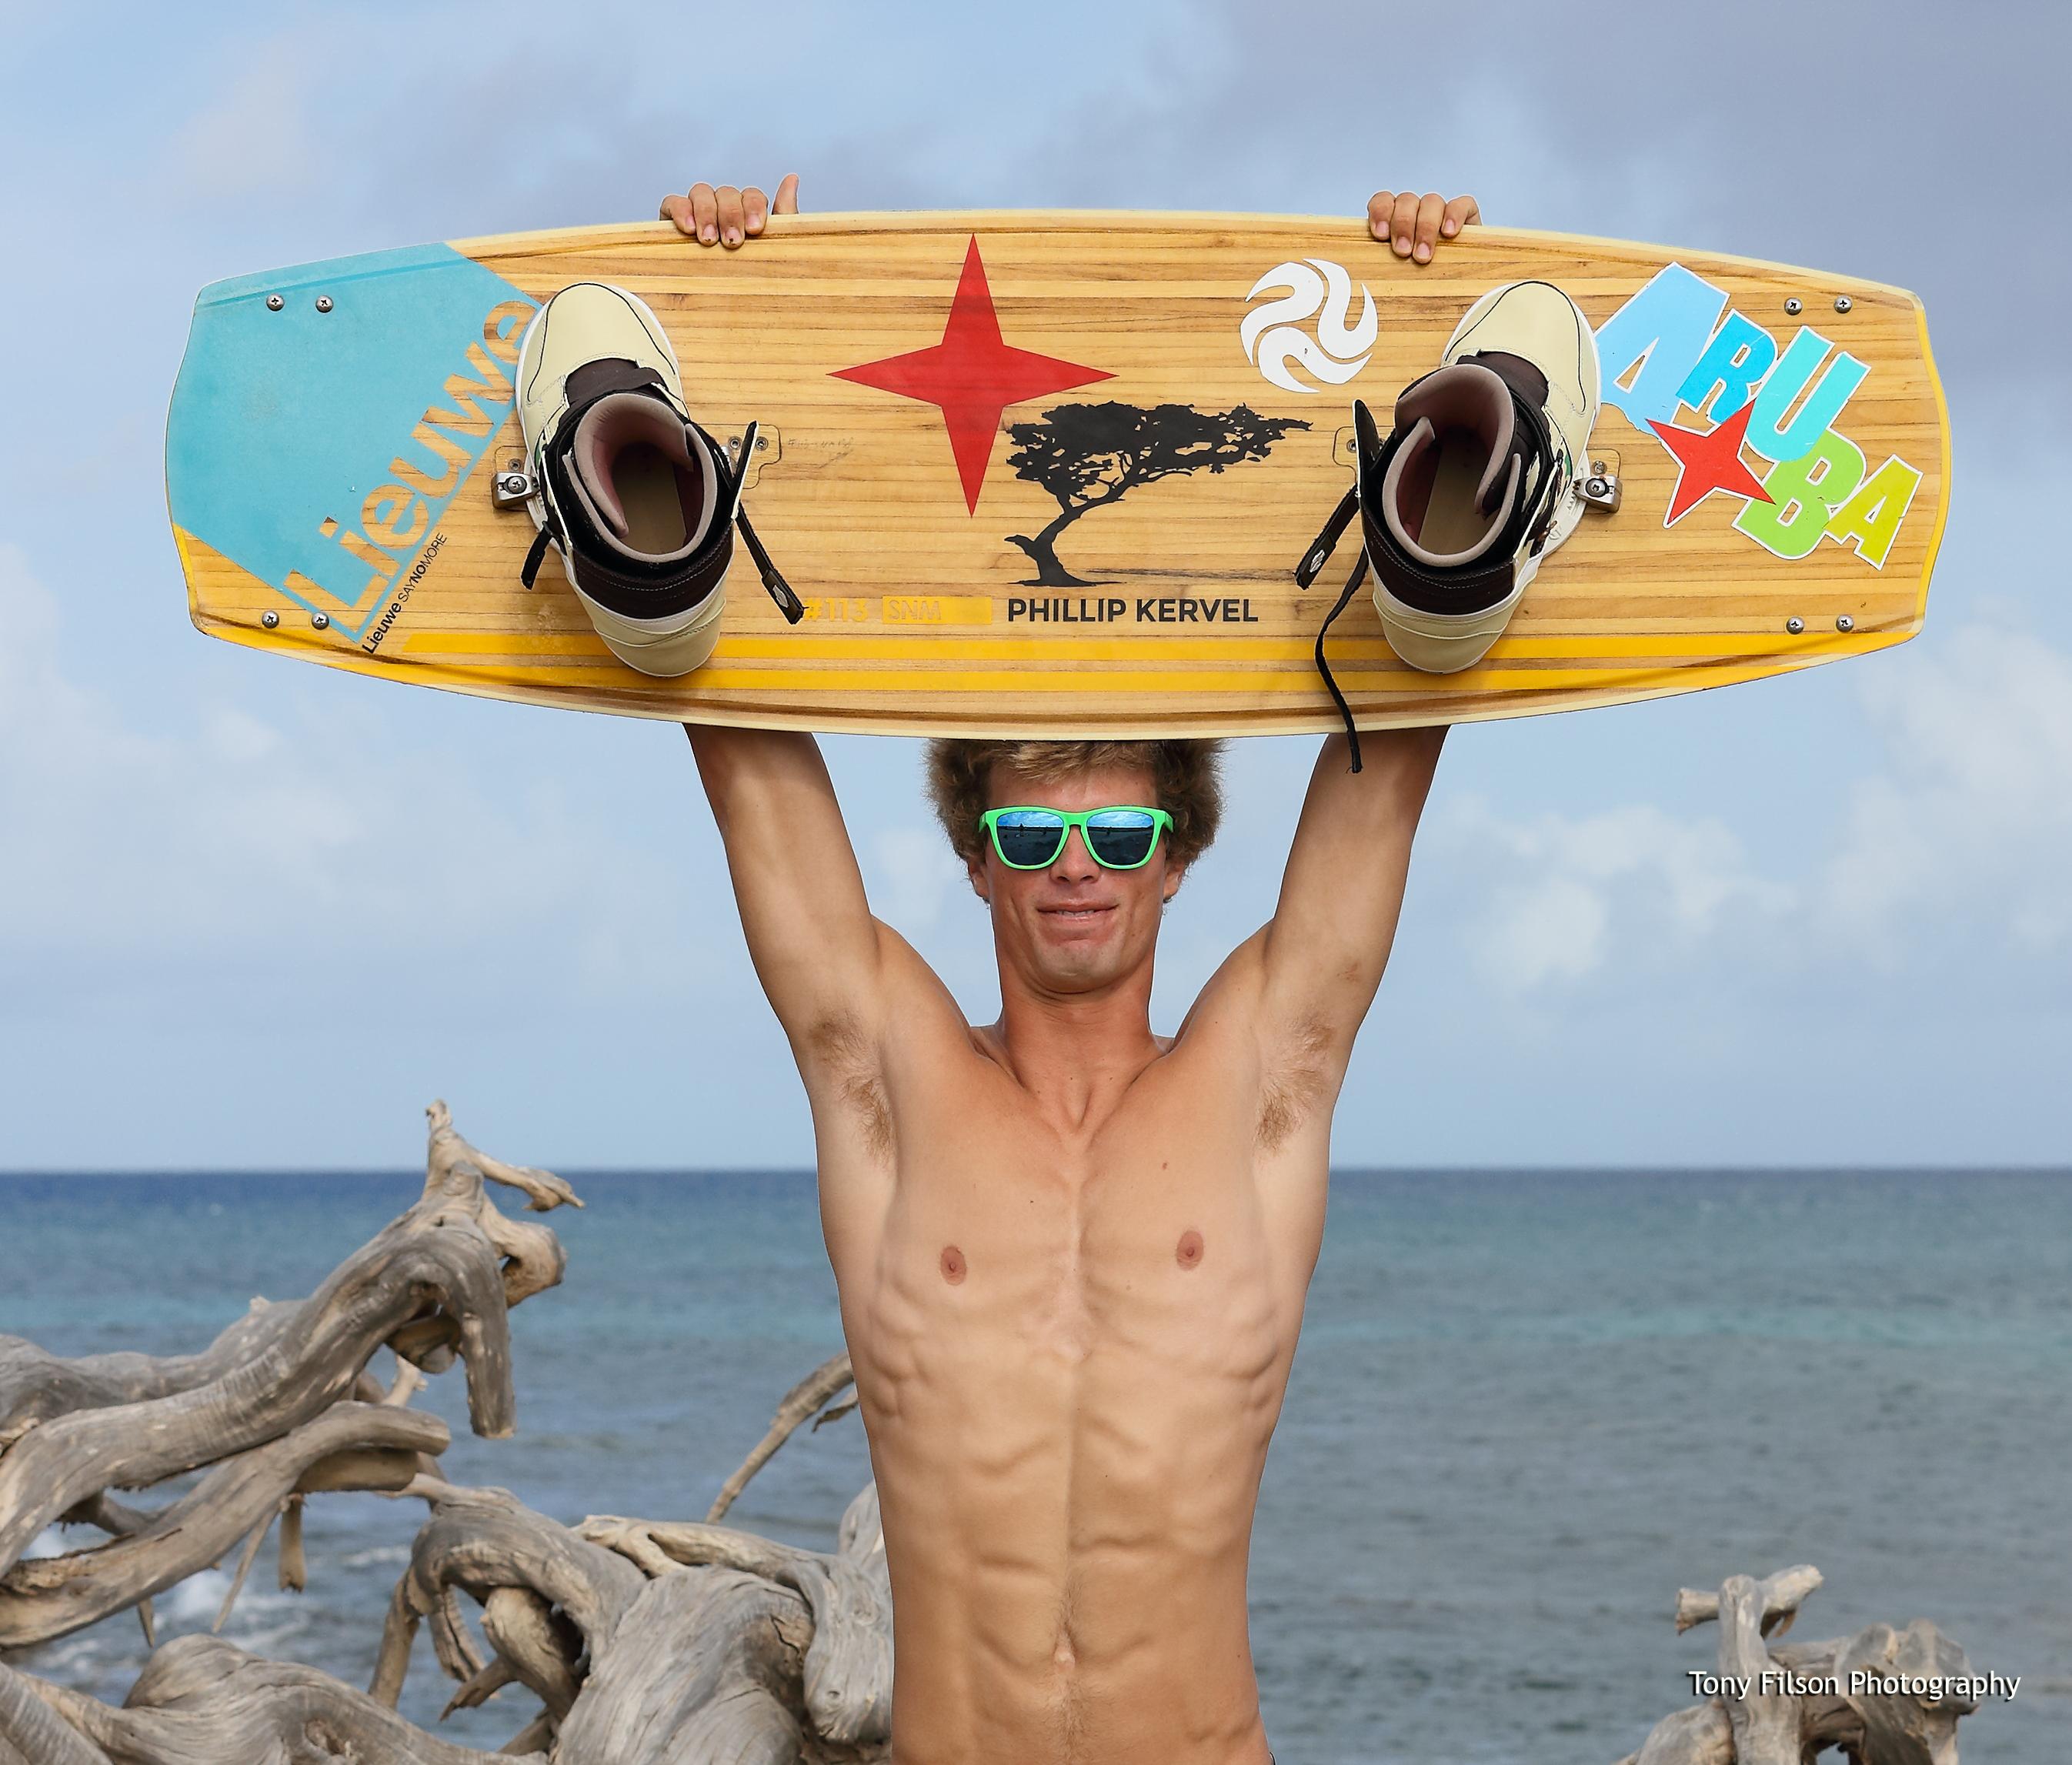 Phillip Kervel Kitesurfing Champion